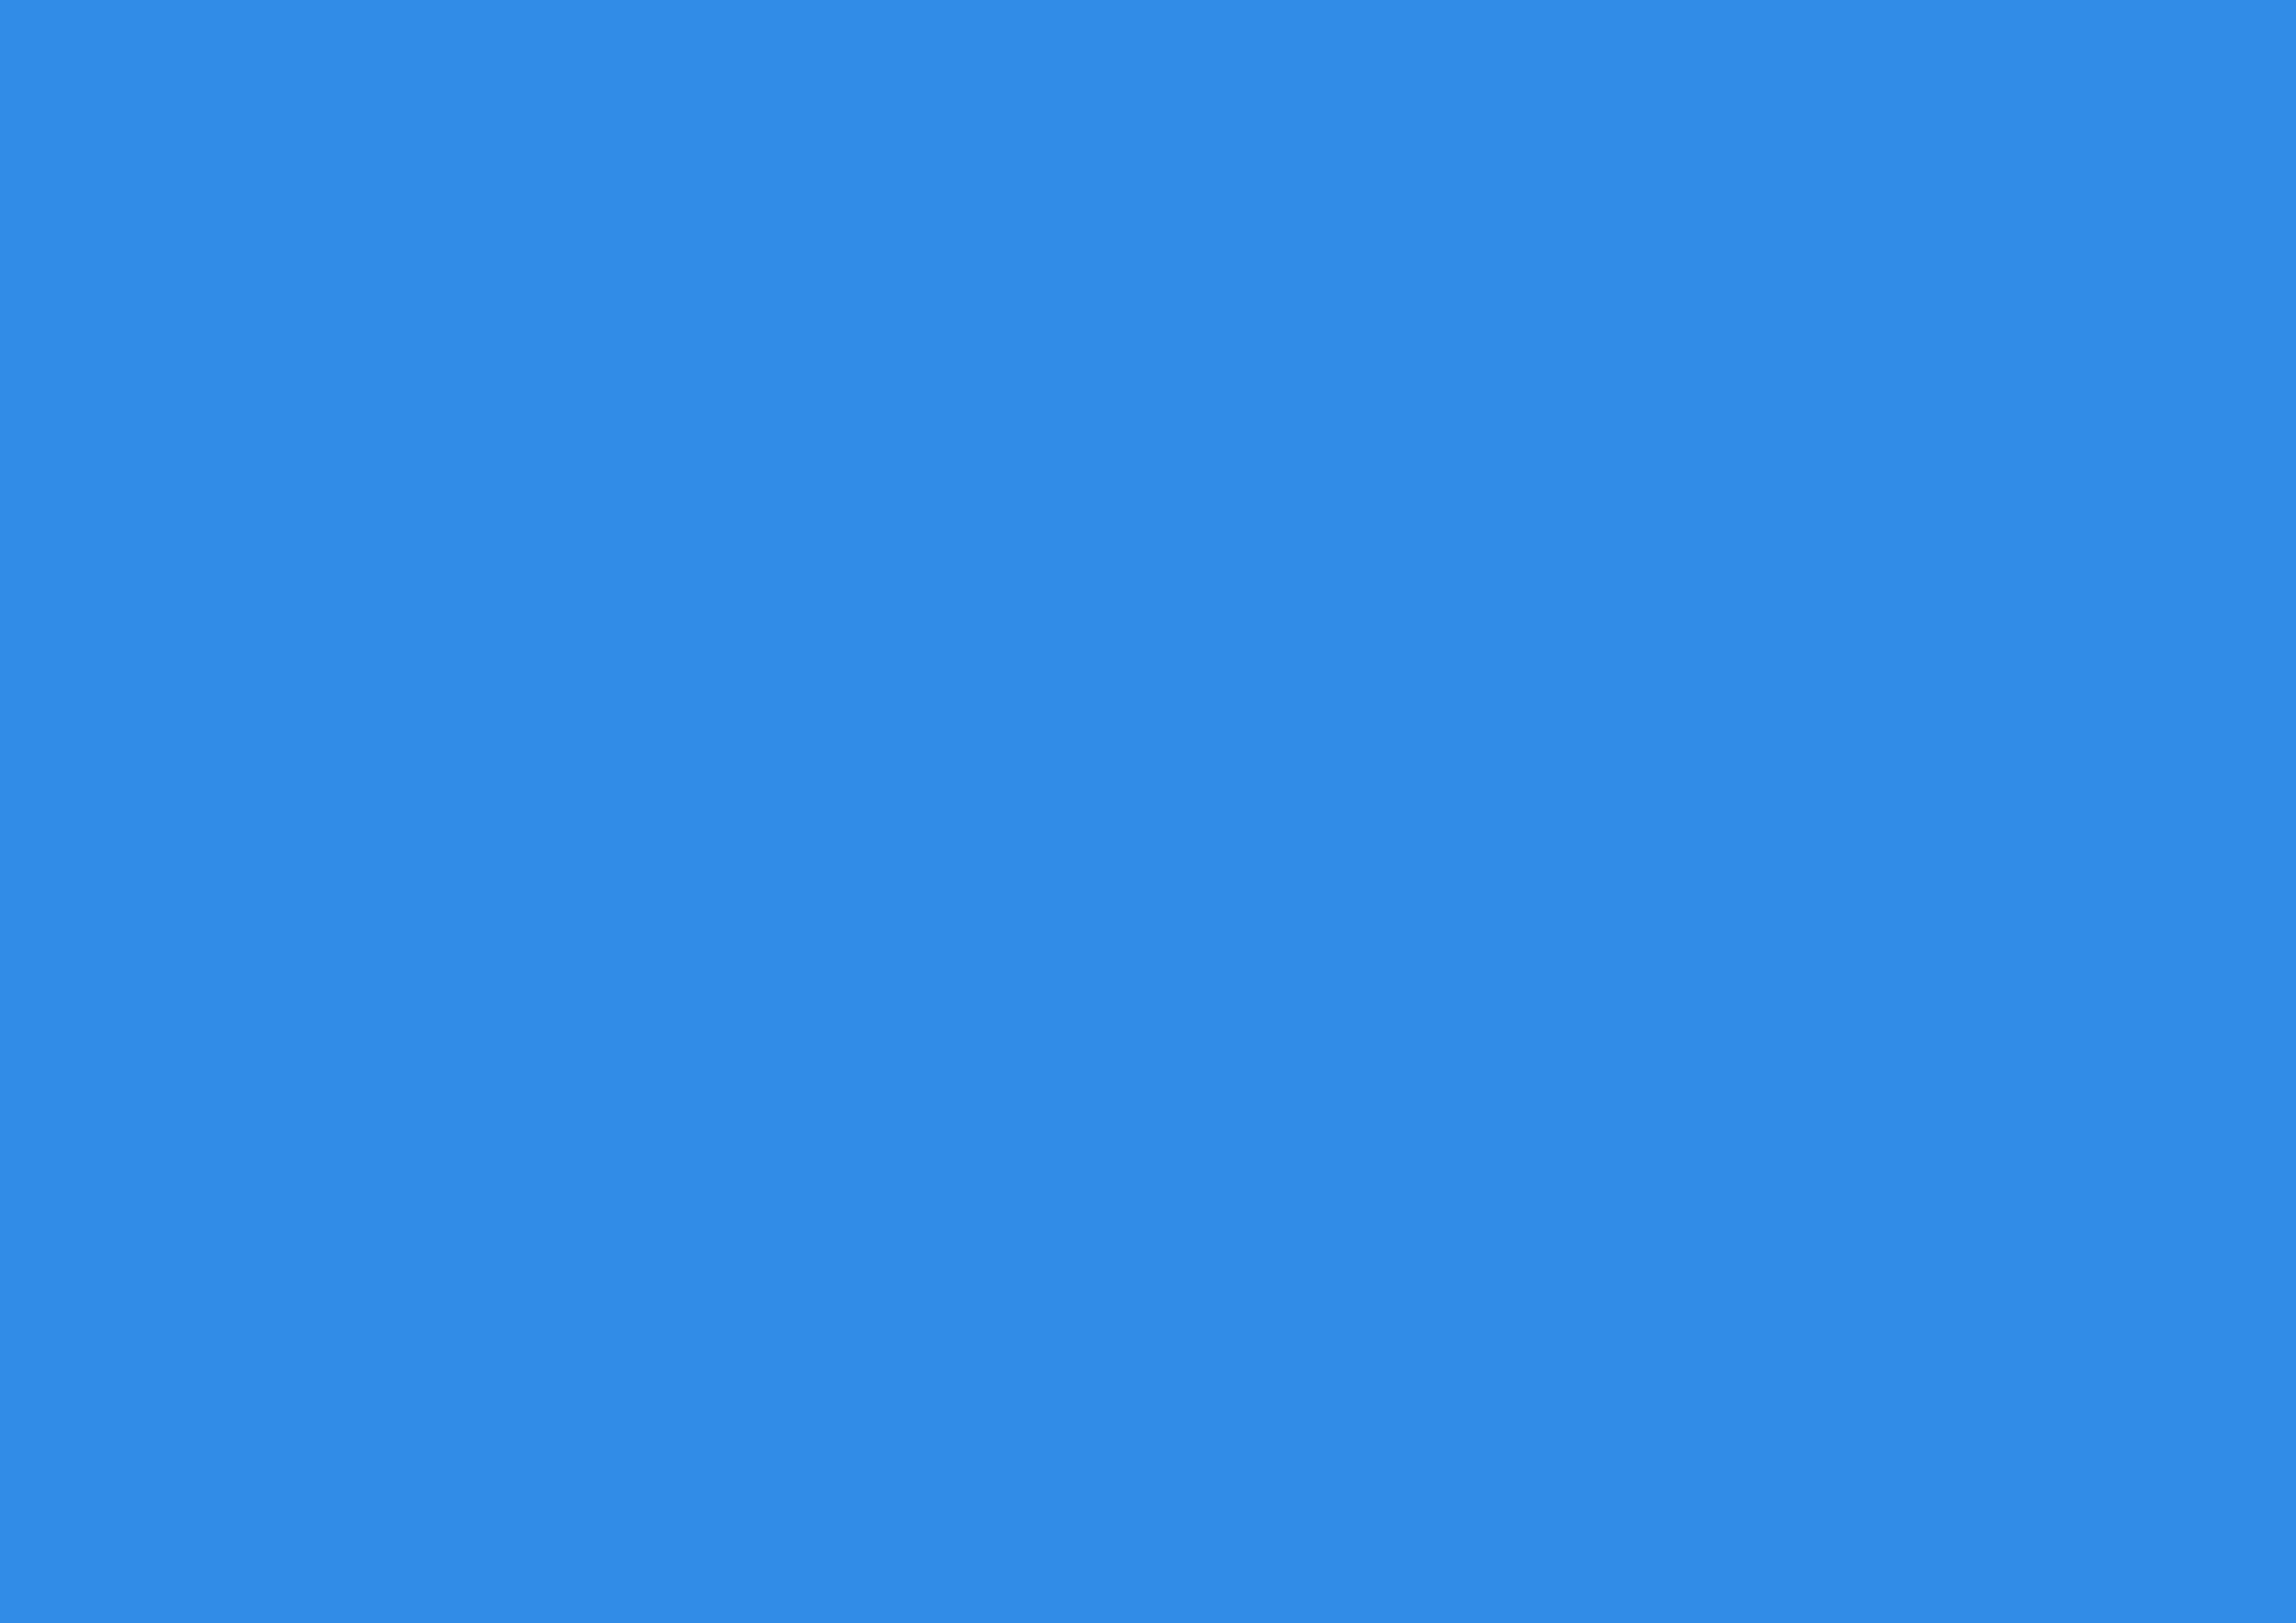 3508x2480 Bleu De France Solid Color Background